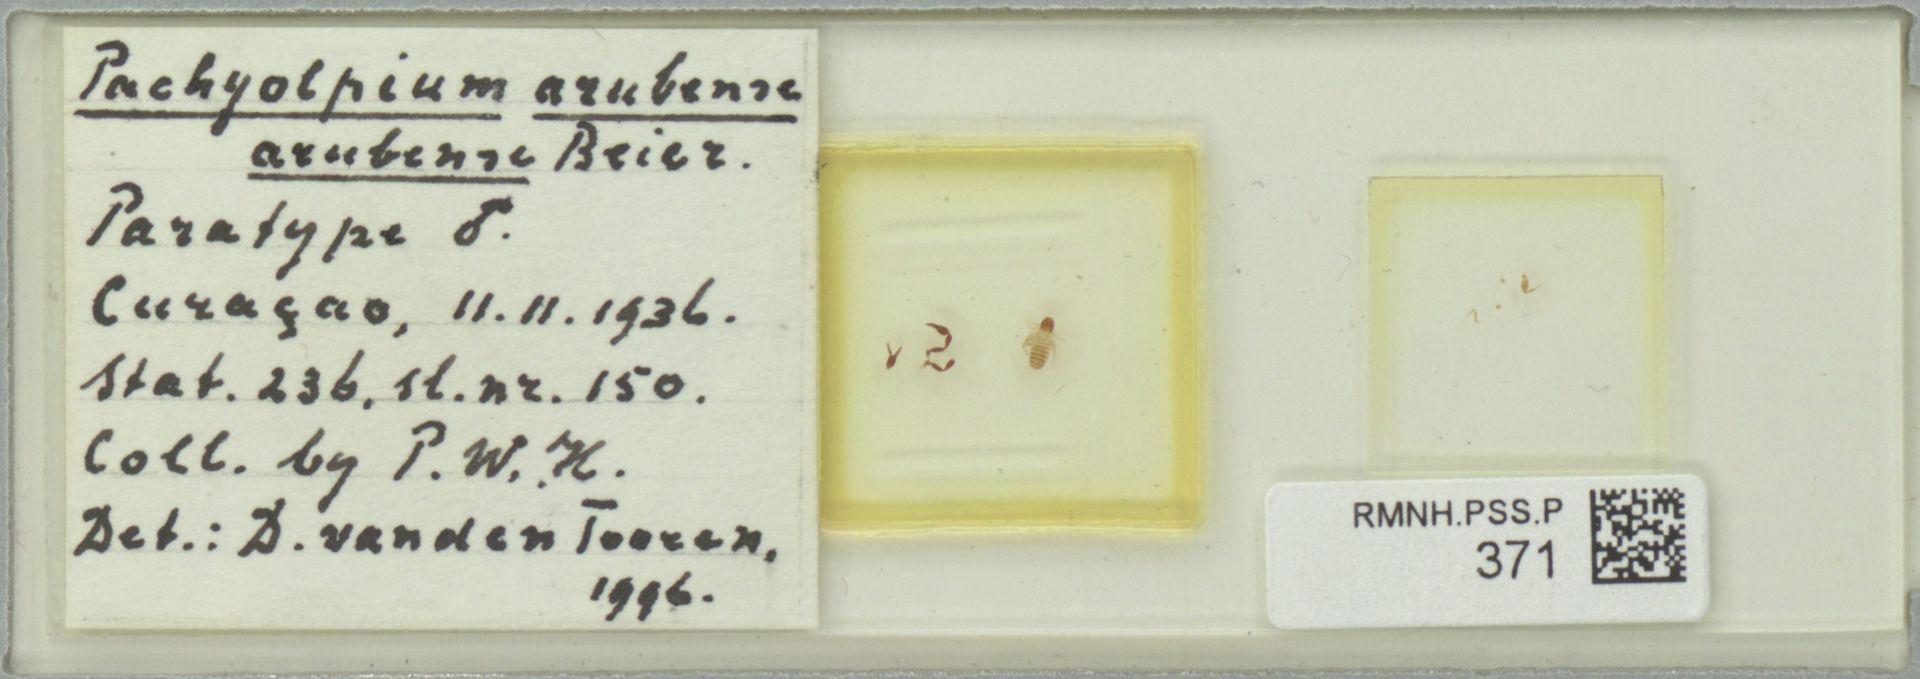 RMNH.PSS.P.371 | Pachyolpium arubense arubense